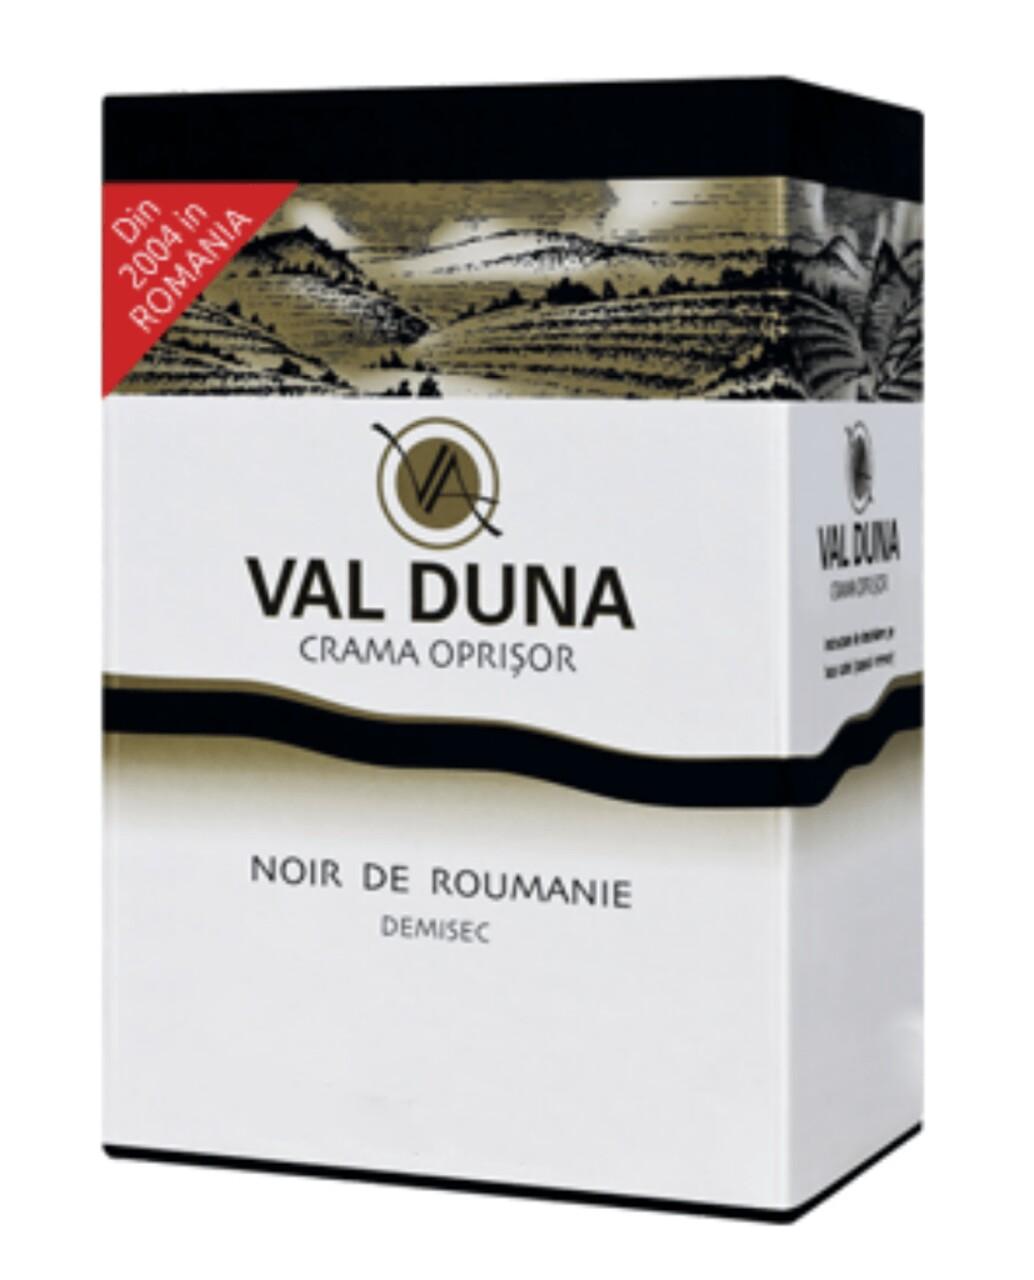 Oprisor Val Duna Noir de Roumanie BIB 10L